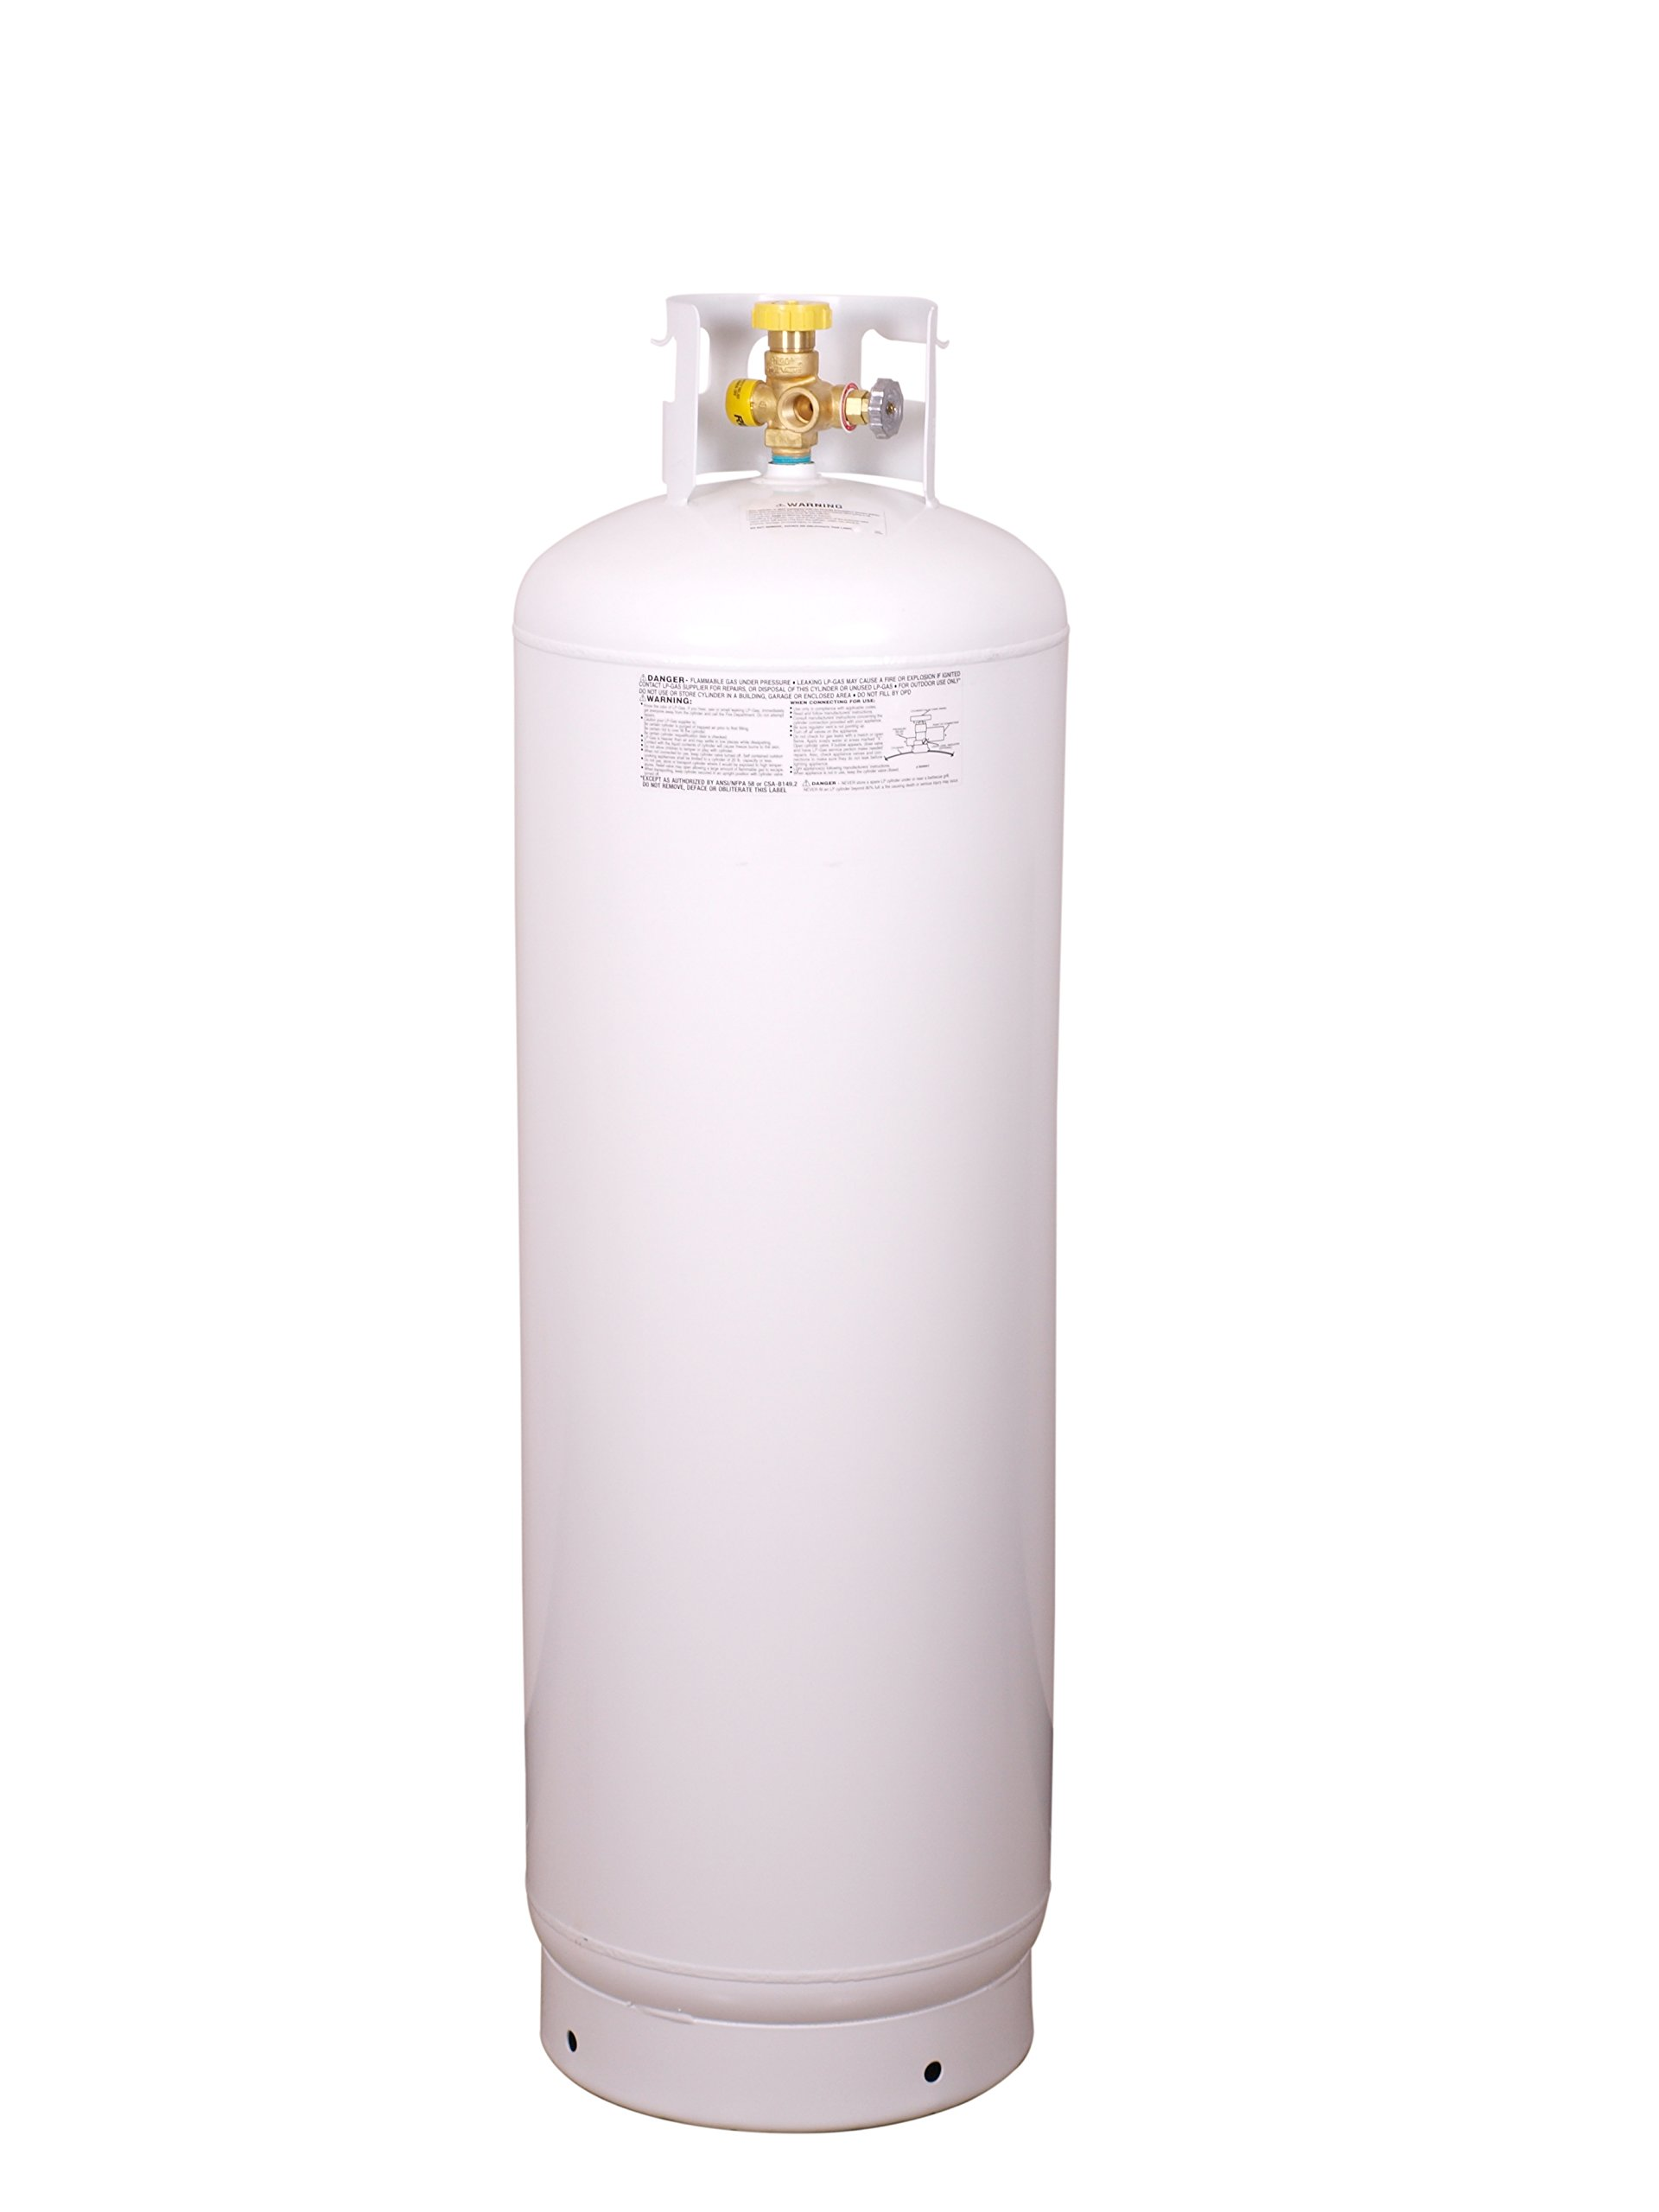 Worthington 282170 Empty Steel Propane Cylinder with Multi-Valve, 100-Pound